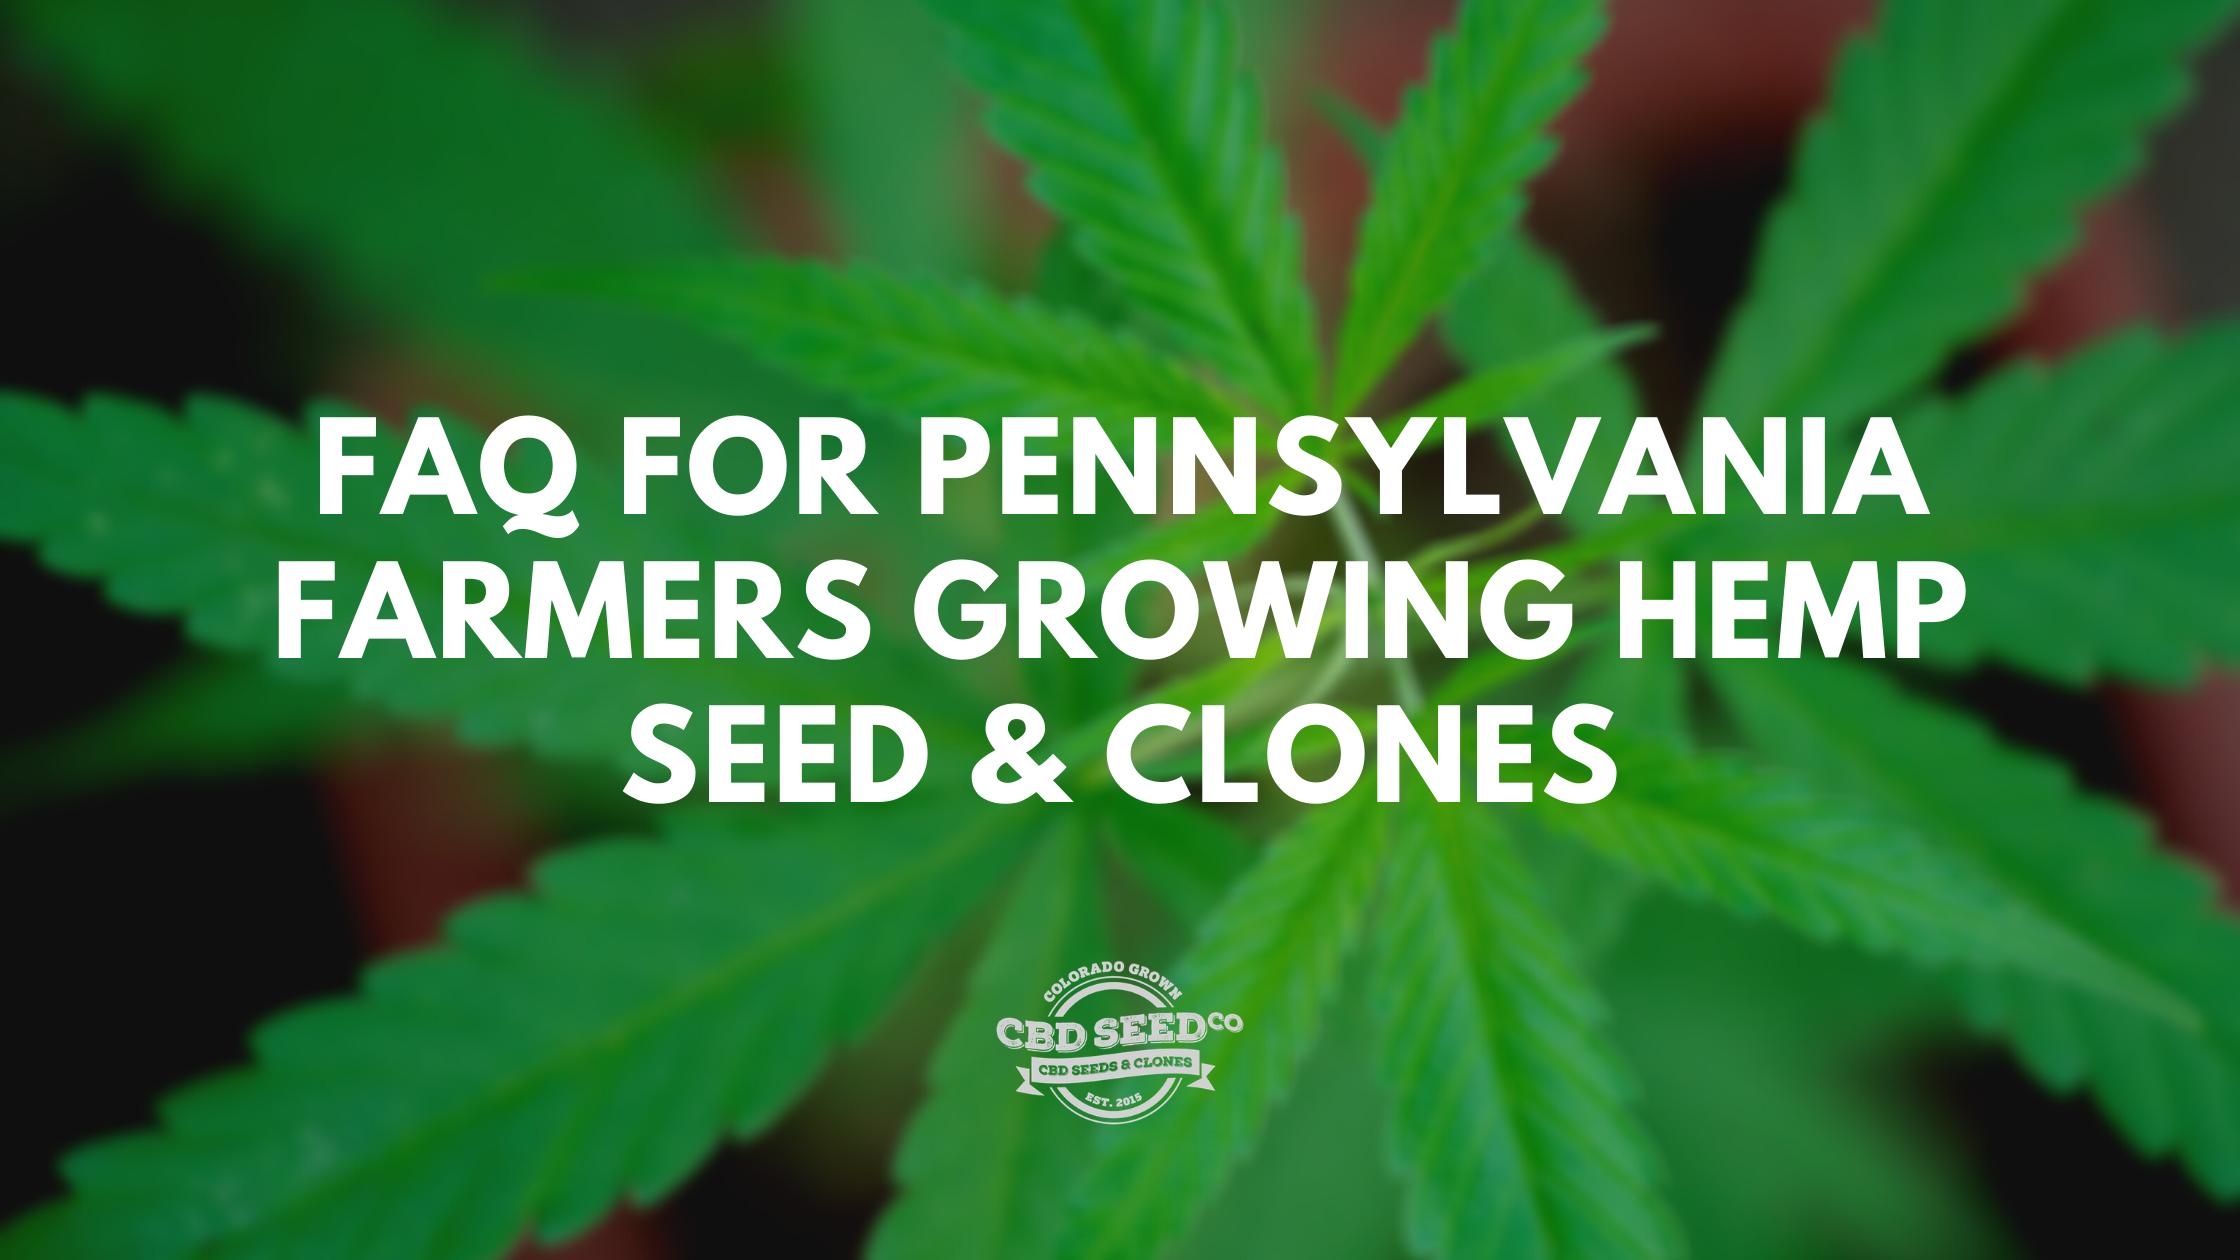 Faq For Pennsylvania Farmers Growing Hemp Seed Clones Cbd Seed Co